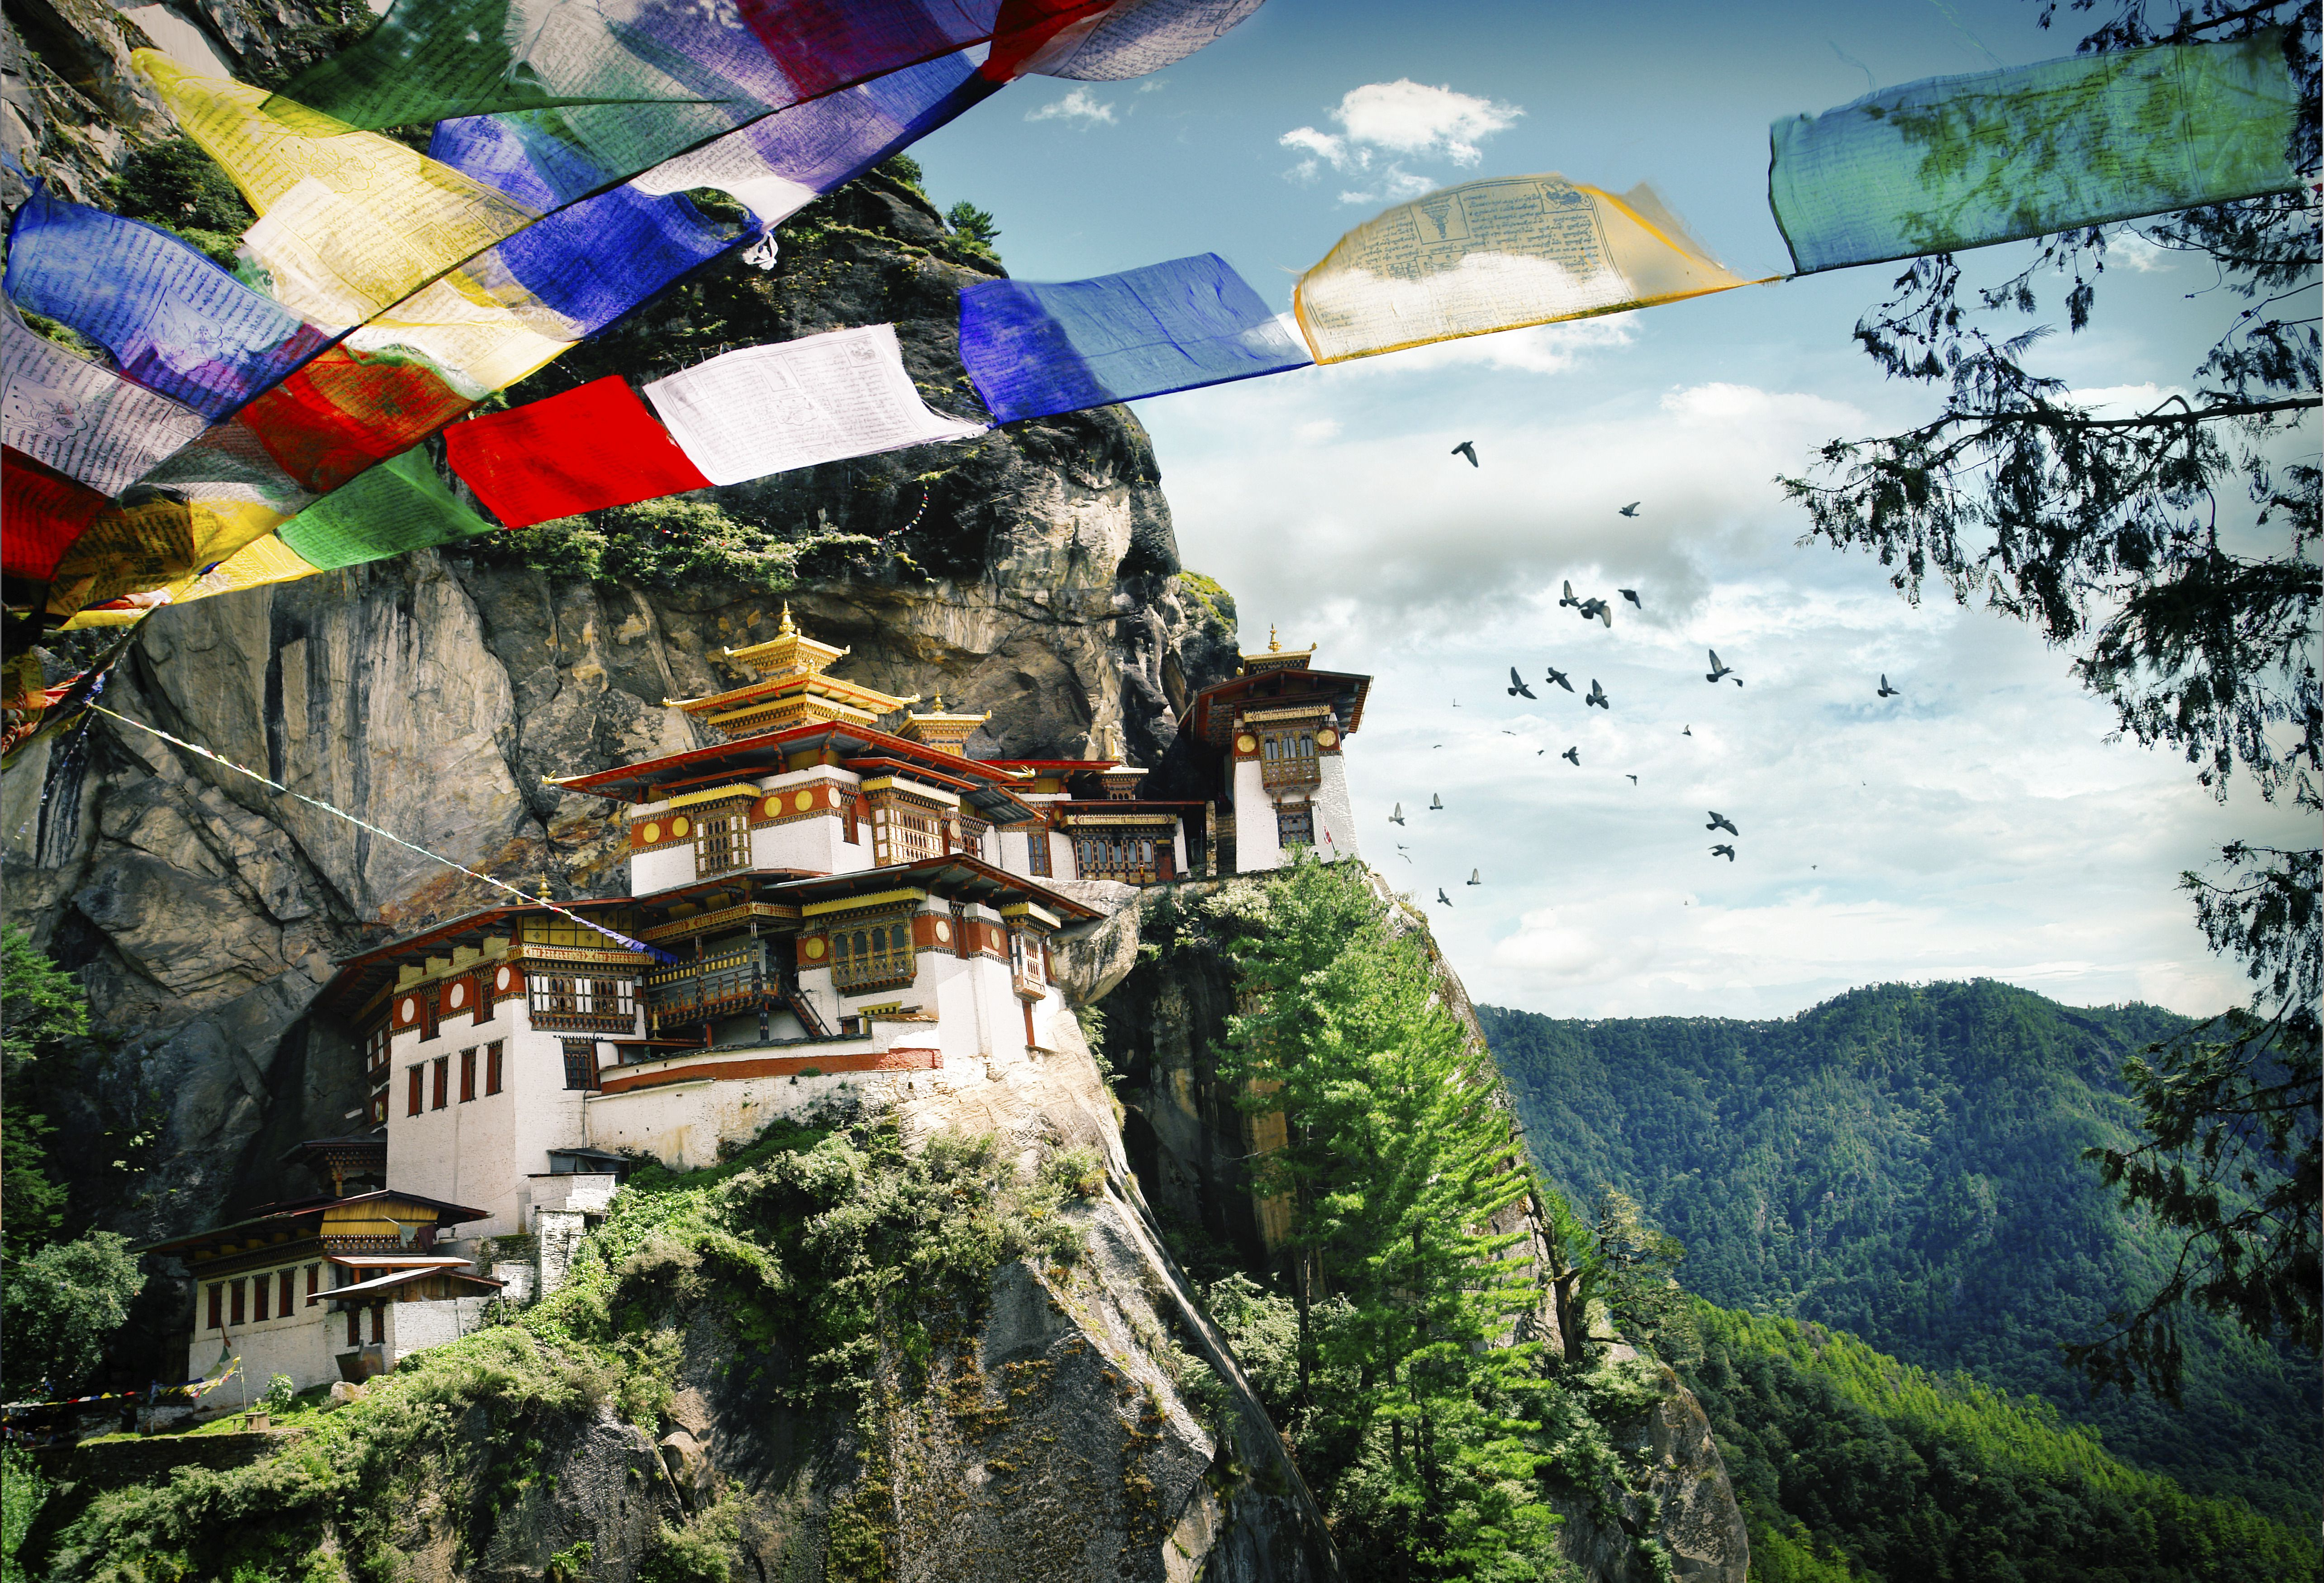 23 Interesting Facts About Bhutan: Where Is Bhutan?